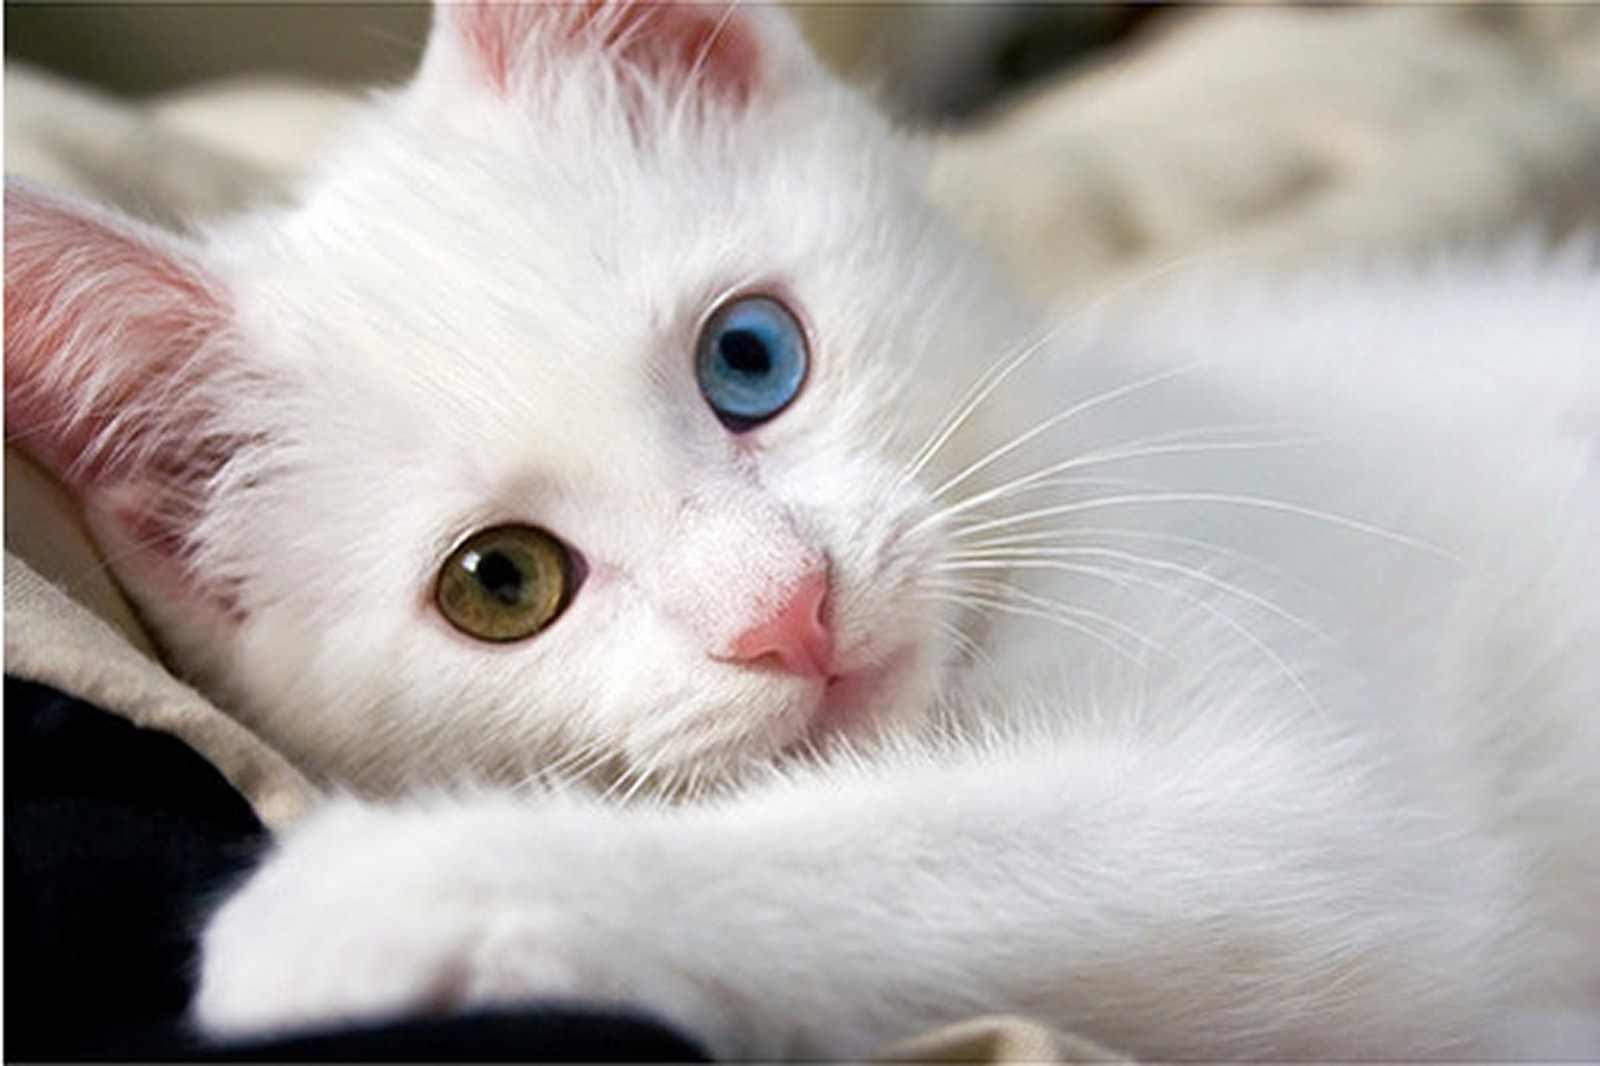 بالصور قطط وكلاب , صور اجمل قطط وكلاب اليفه وكيوت 4241 6